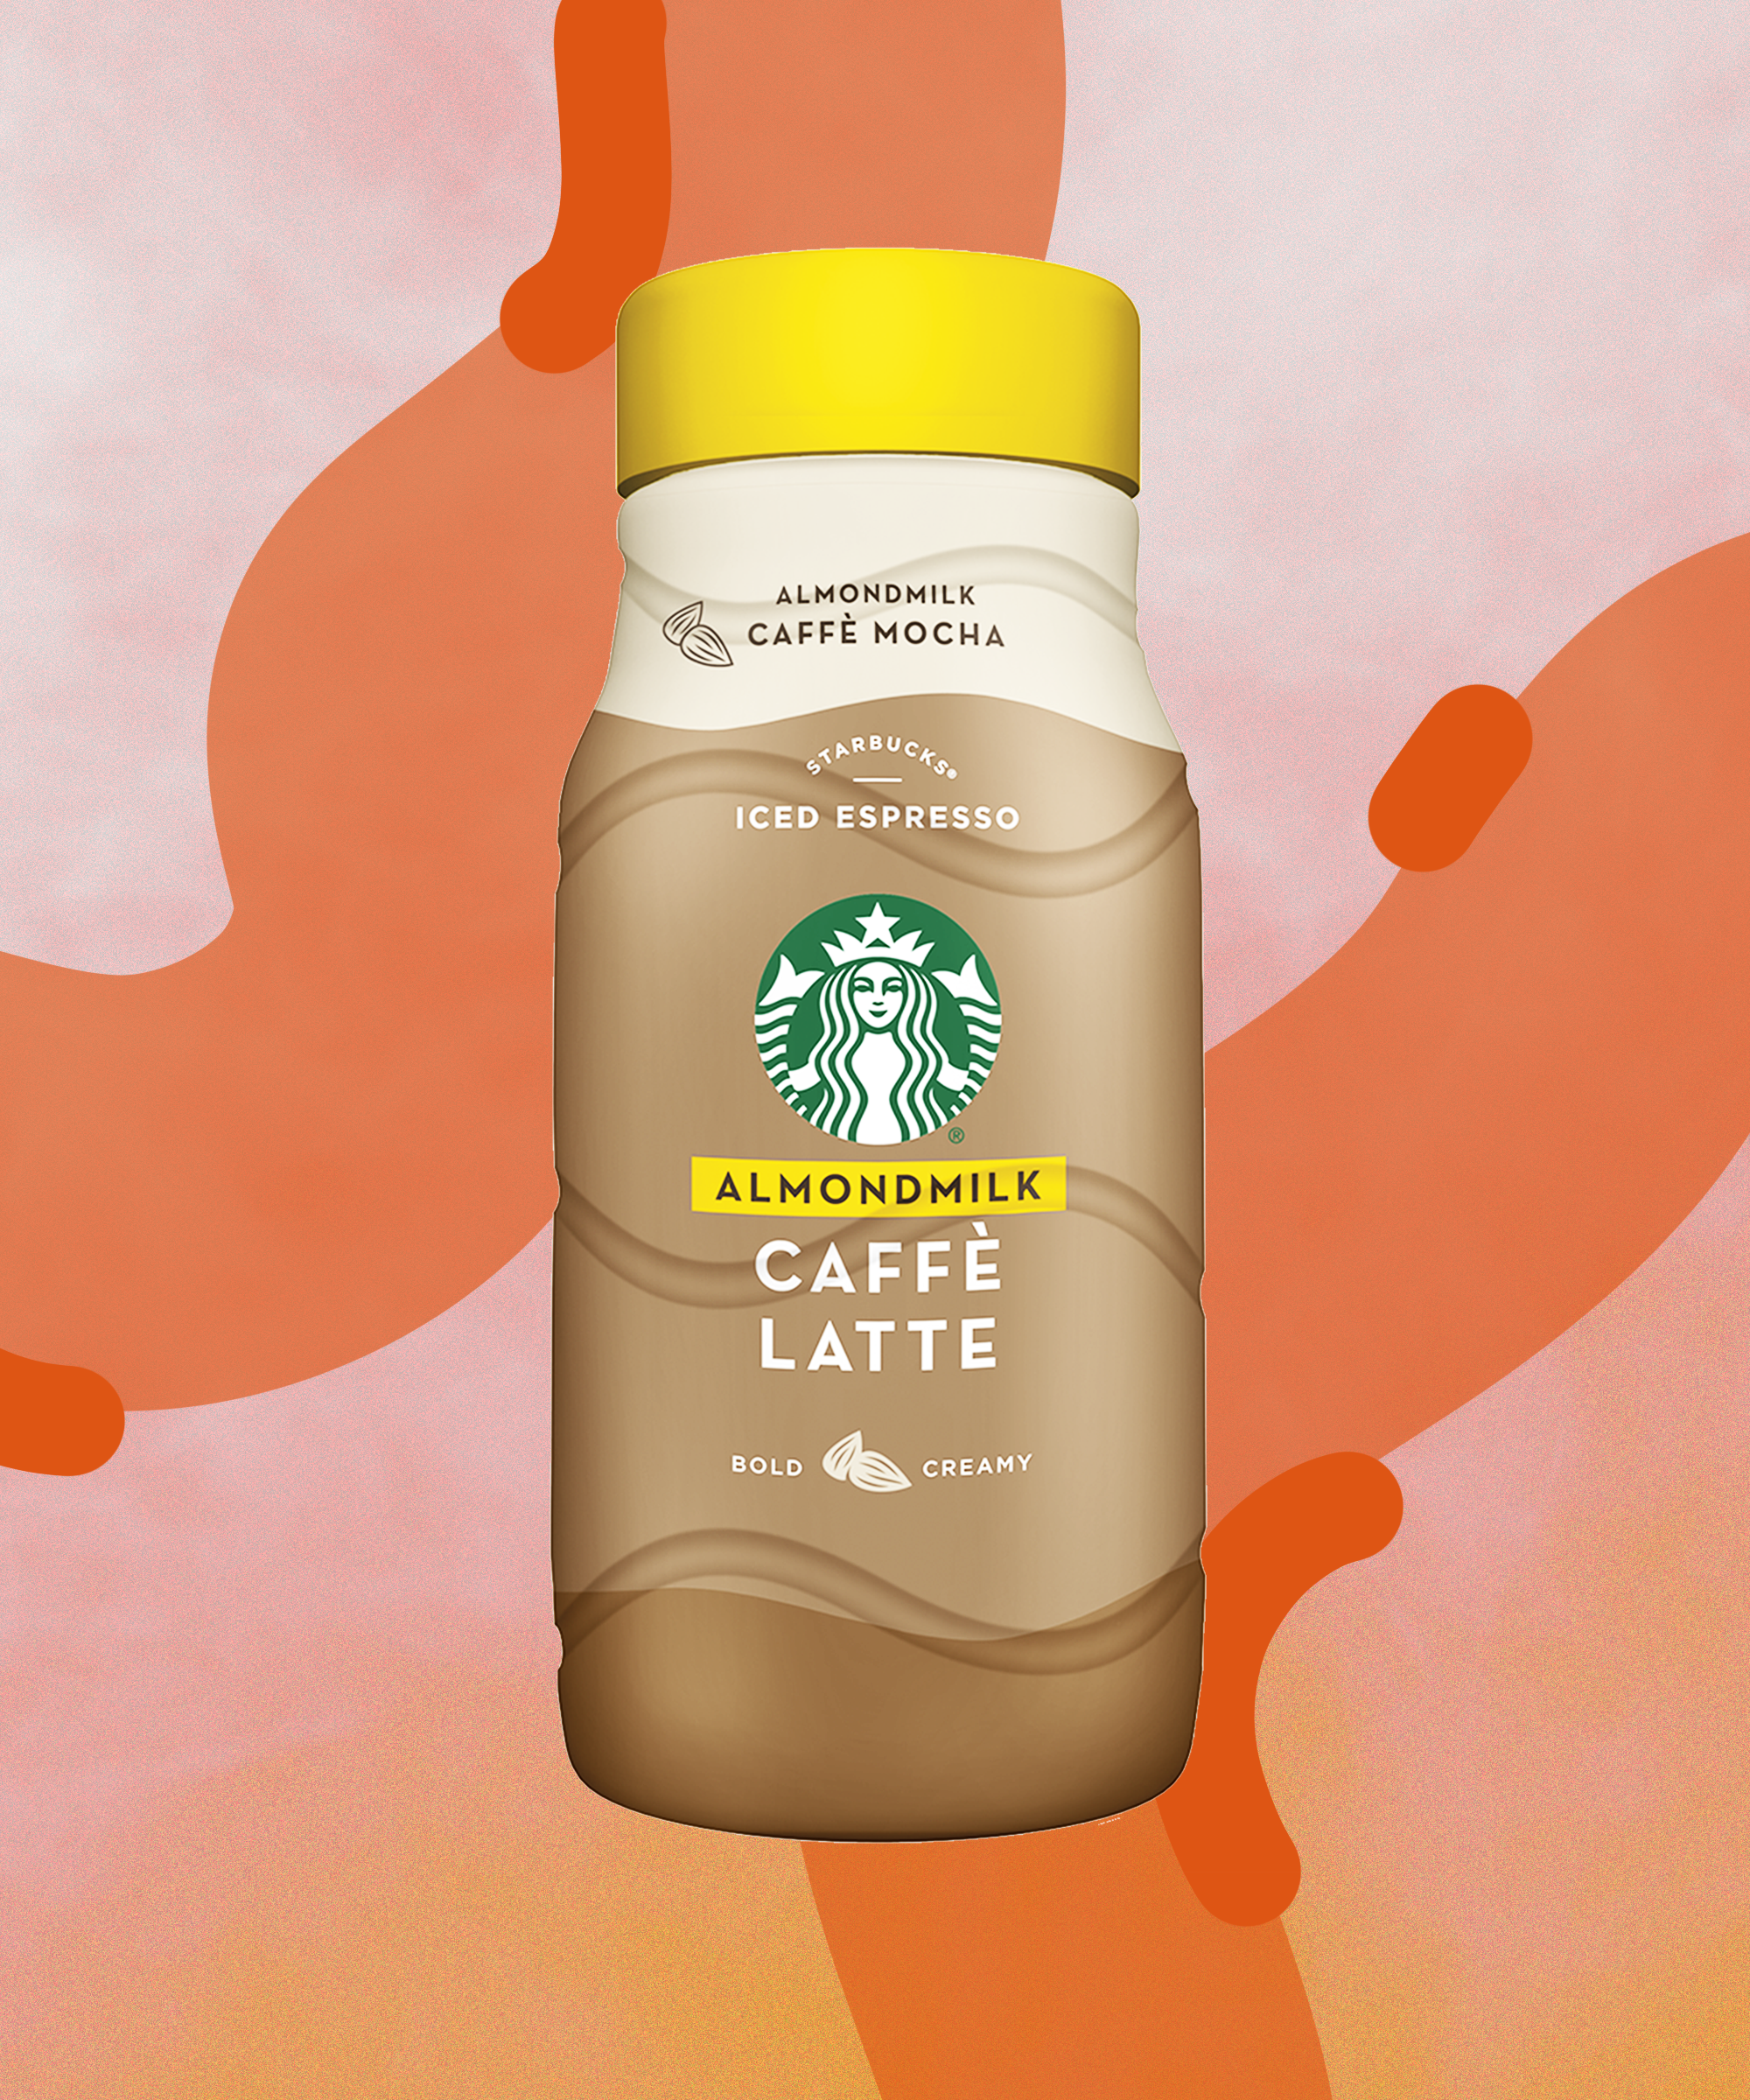 Starbucks Iced Coffee Bottle Uk - Image of Coffee and Tea